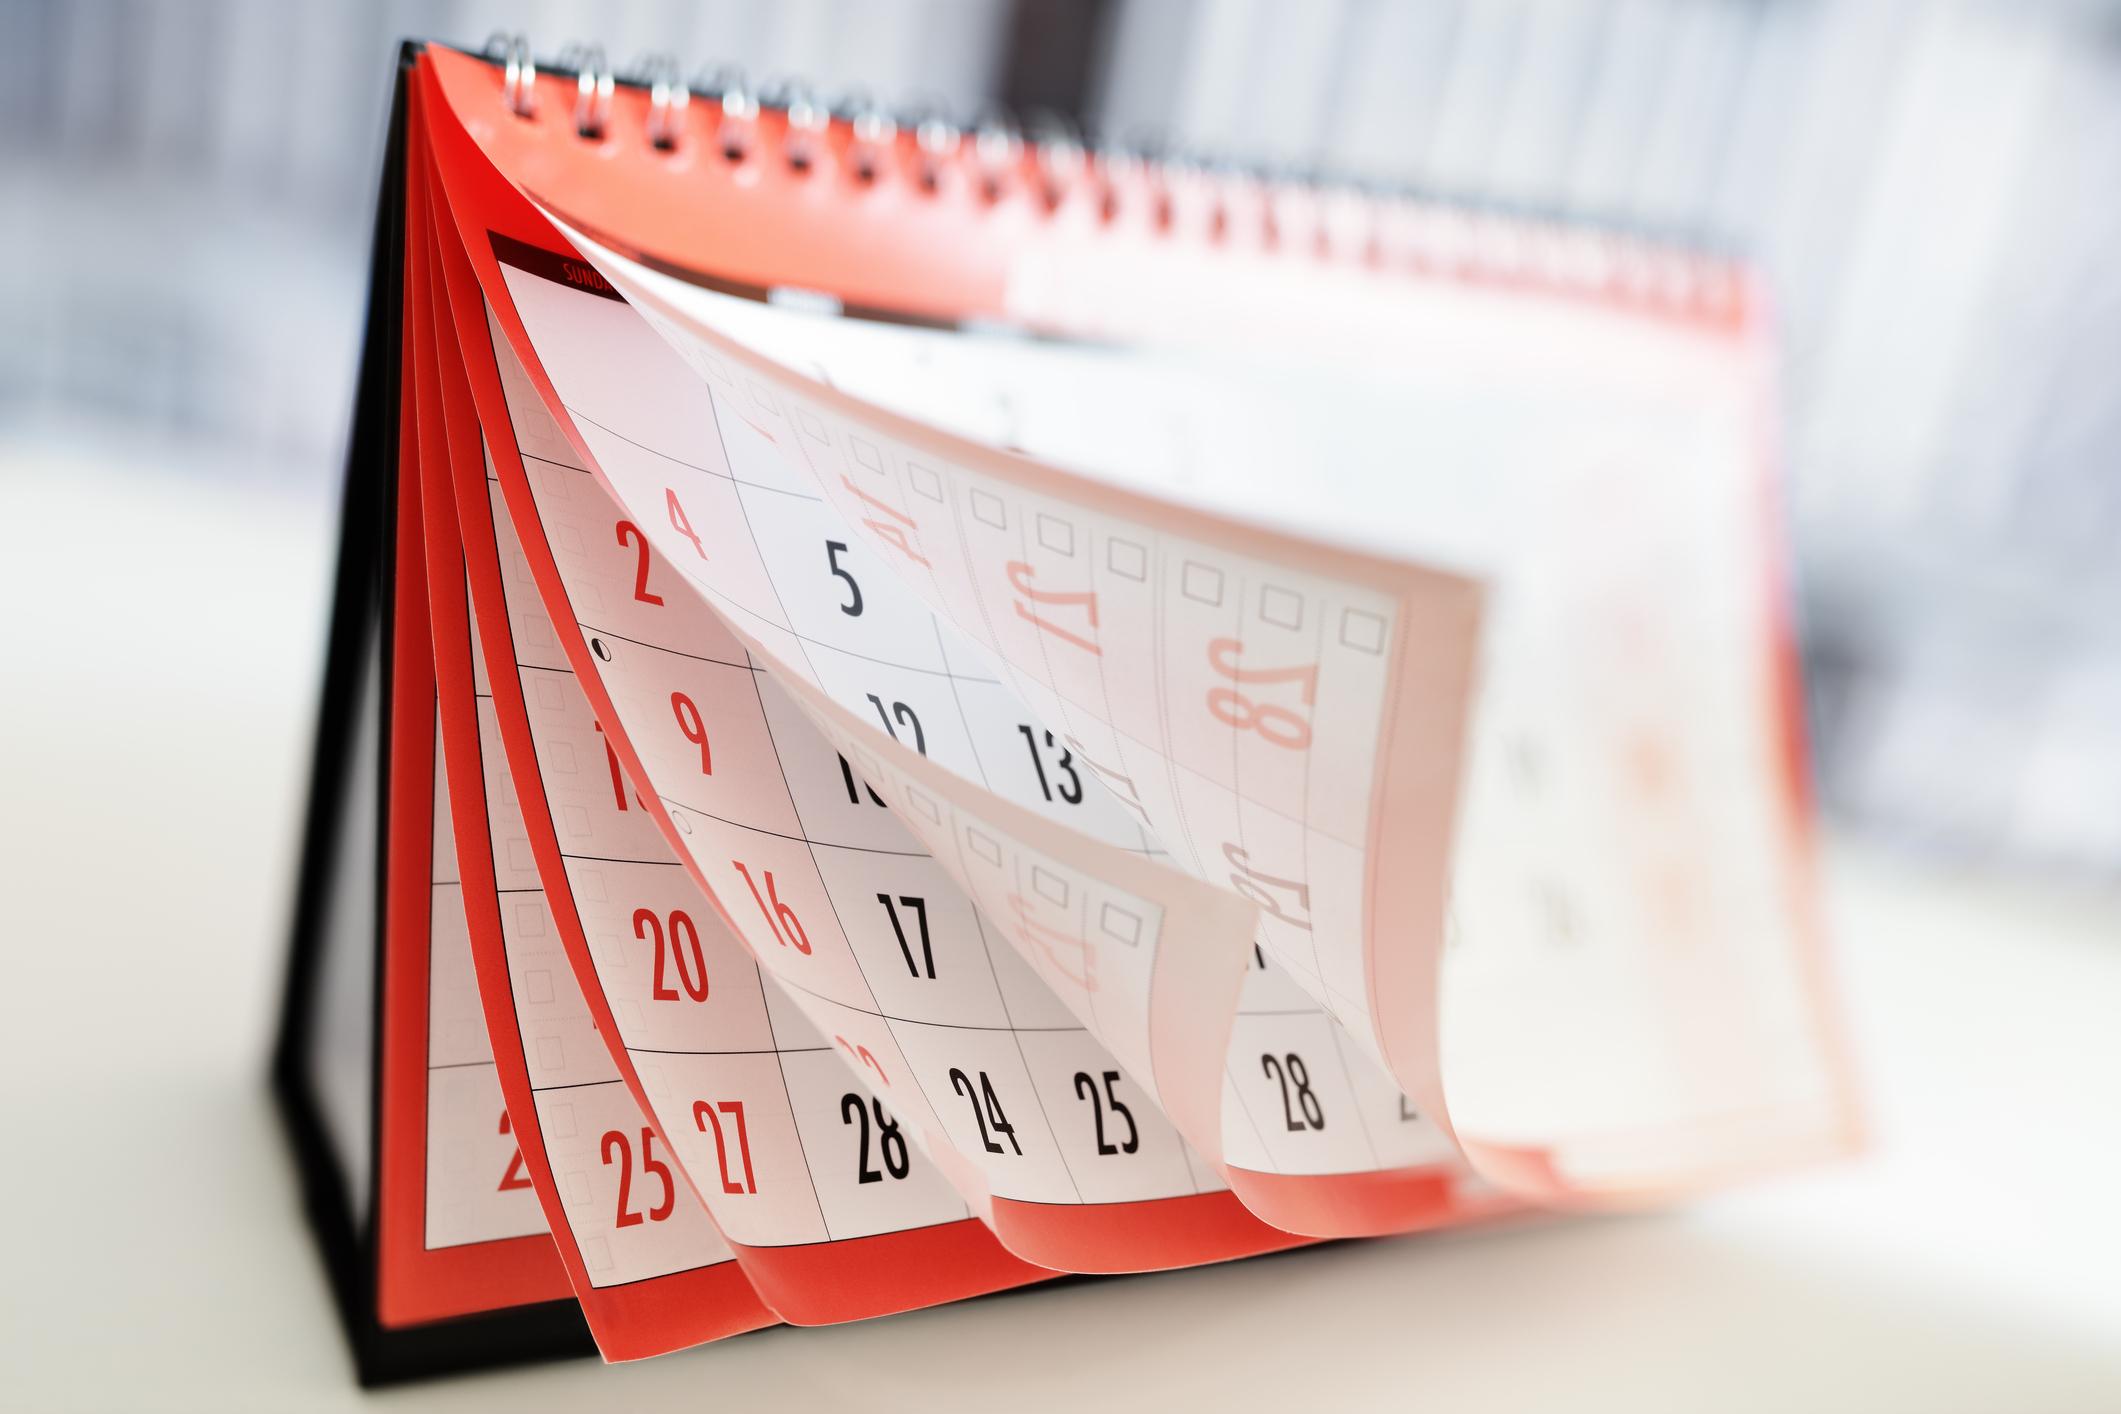 desk calendar flipping through pages